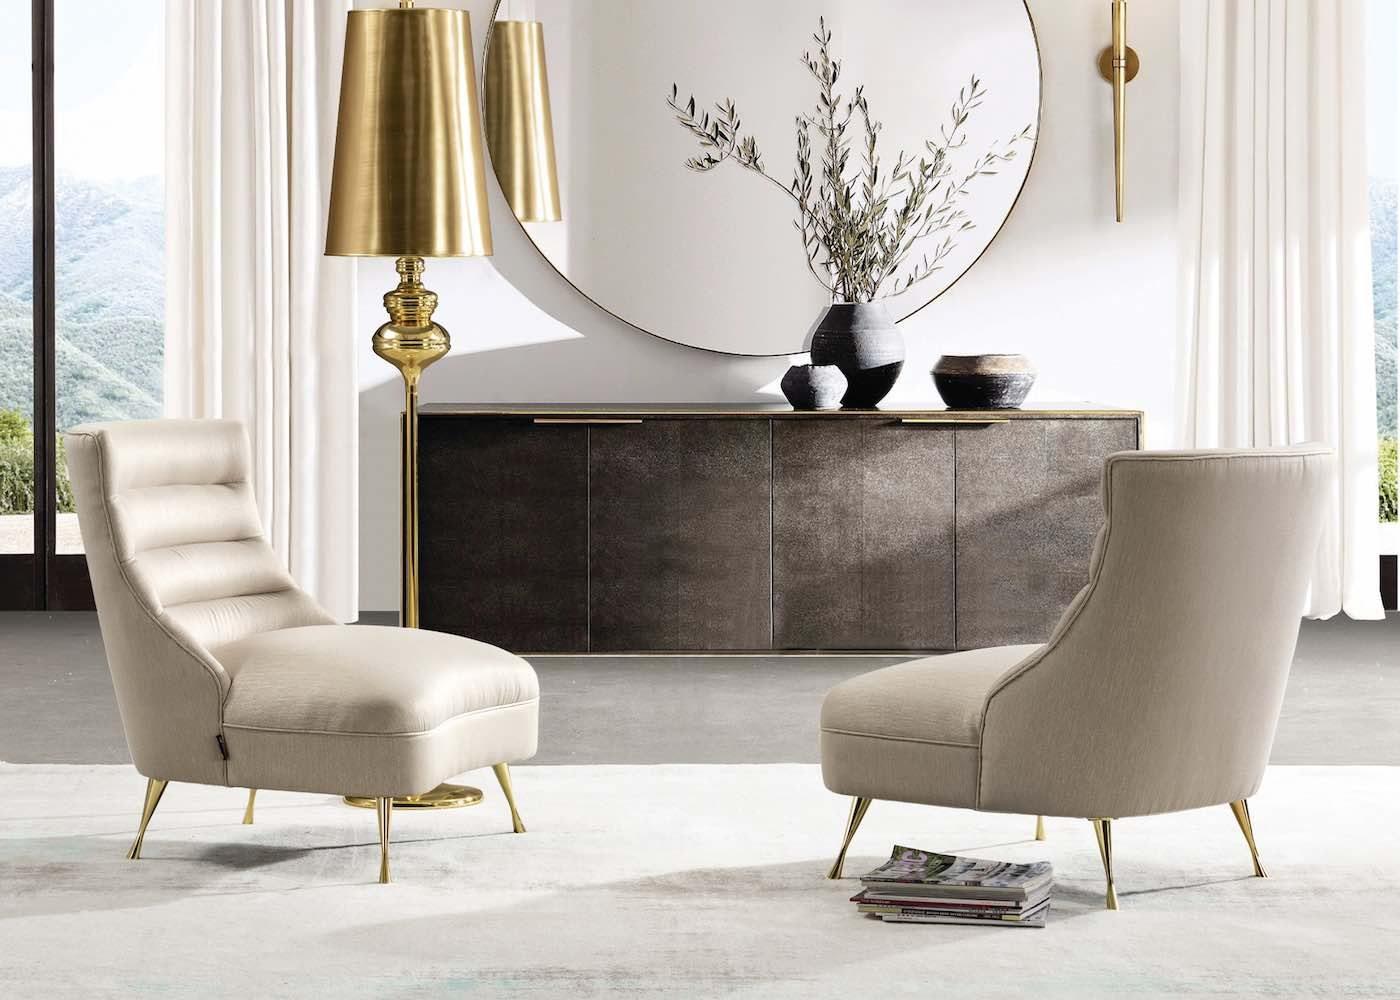 mazarin-ameublement-catalogue-produits-chaise-fauteuil-29